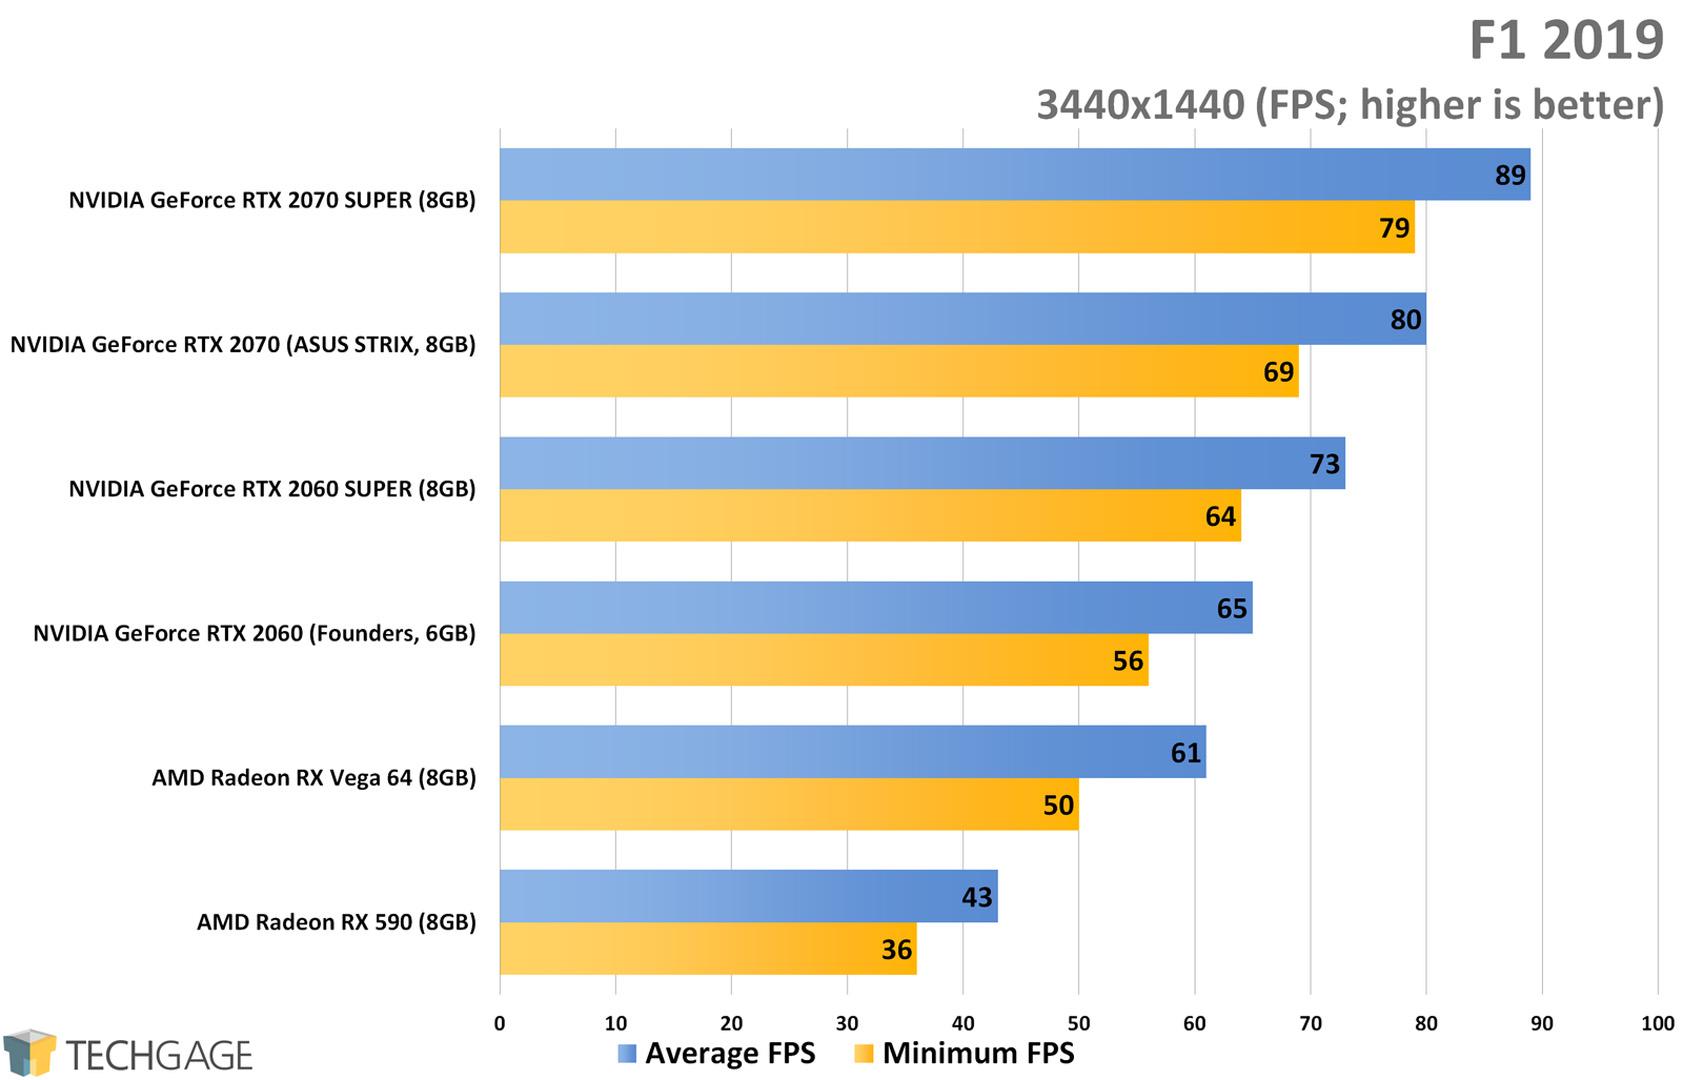 F1 2019 (3440x1440 Ultrawide) - NVIDIA RTX SUPER 2060 and 2070 Performance